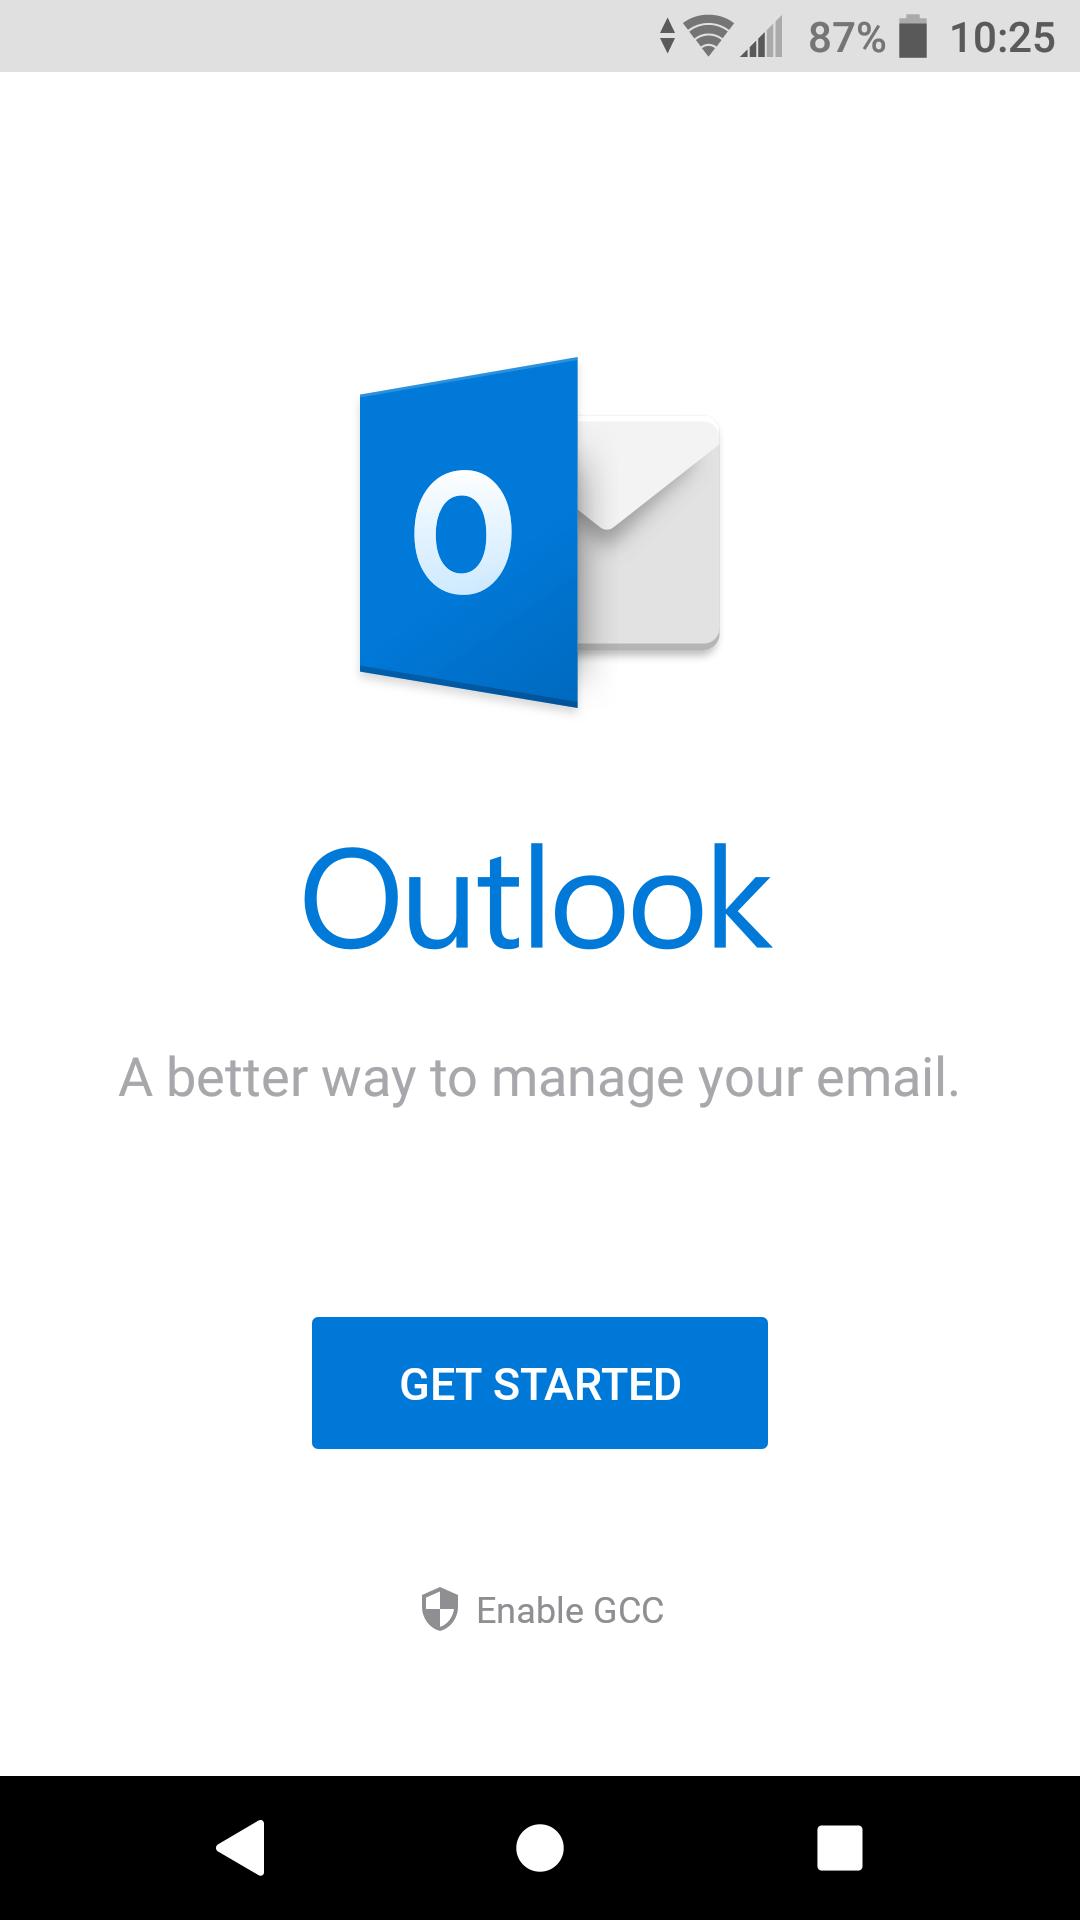 Outlook get started